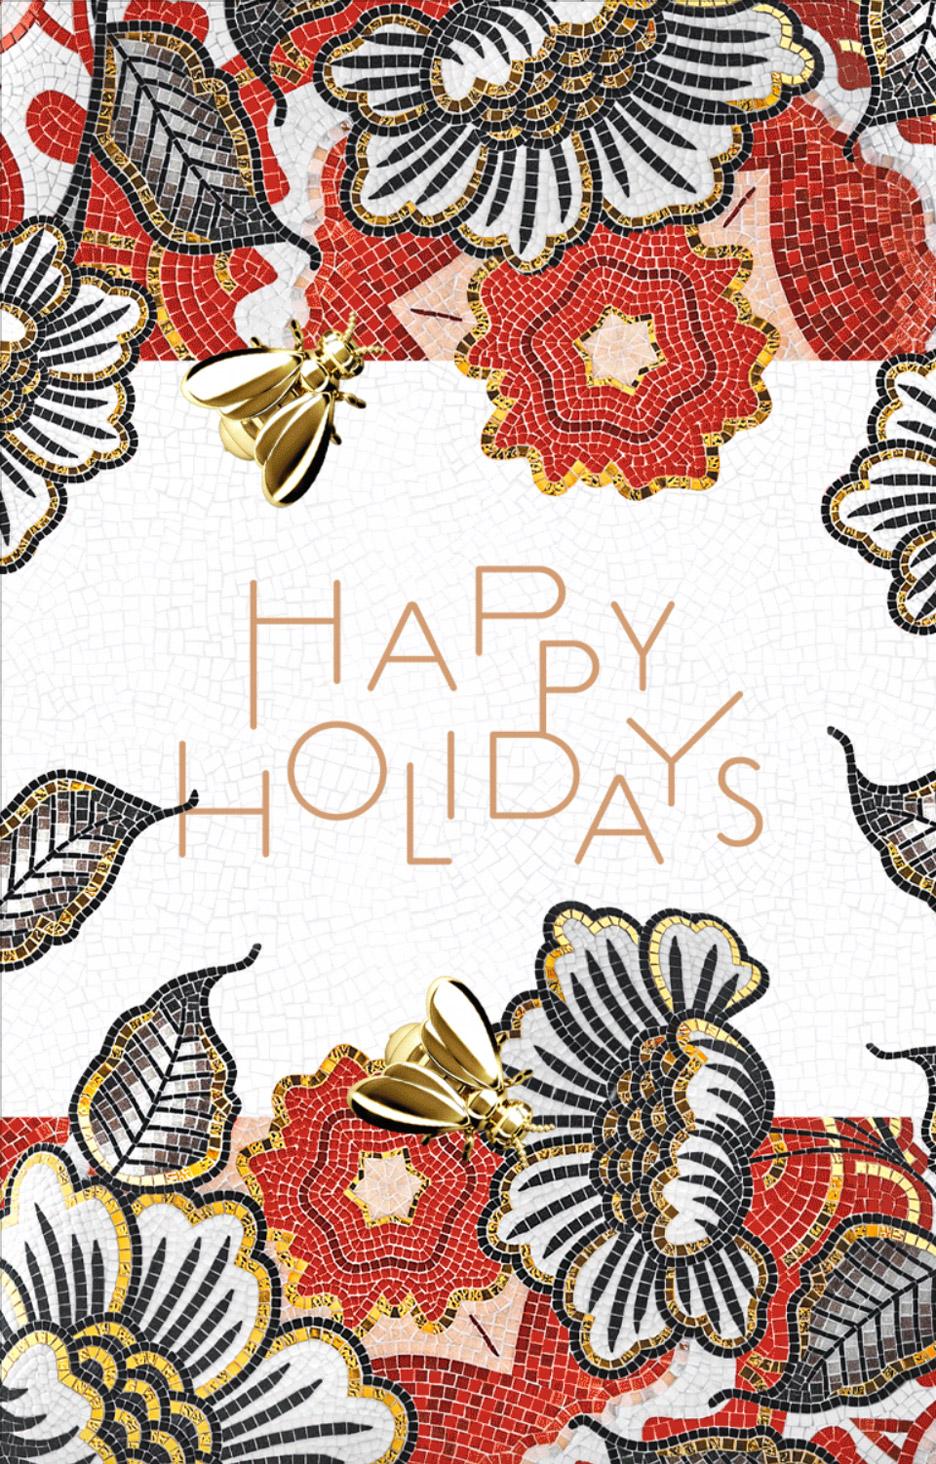 Christmas card by Marcel Wanders